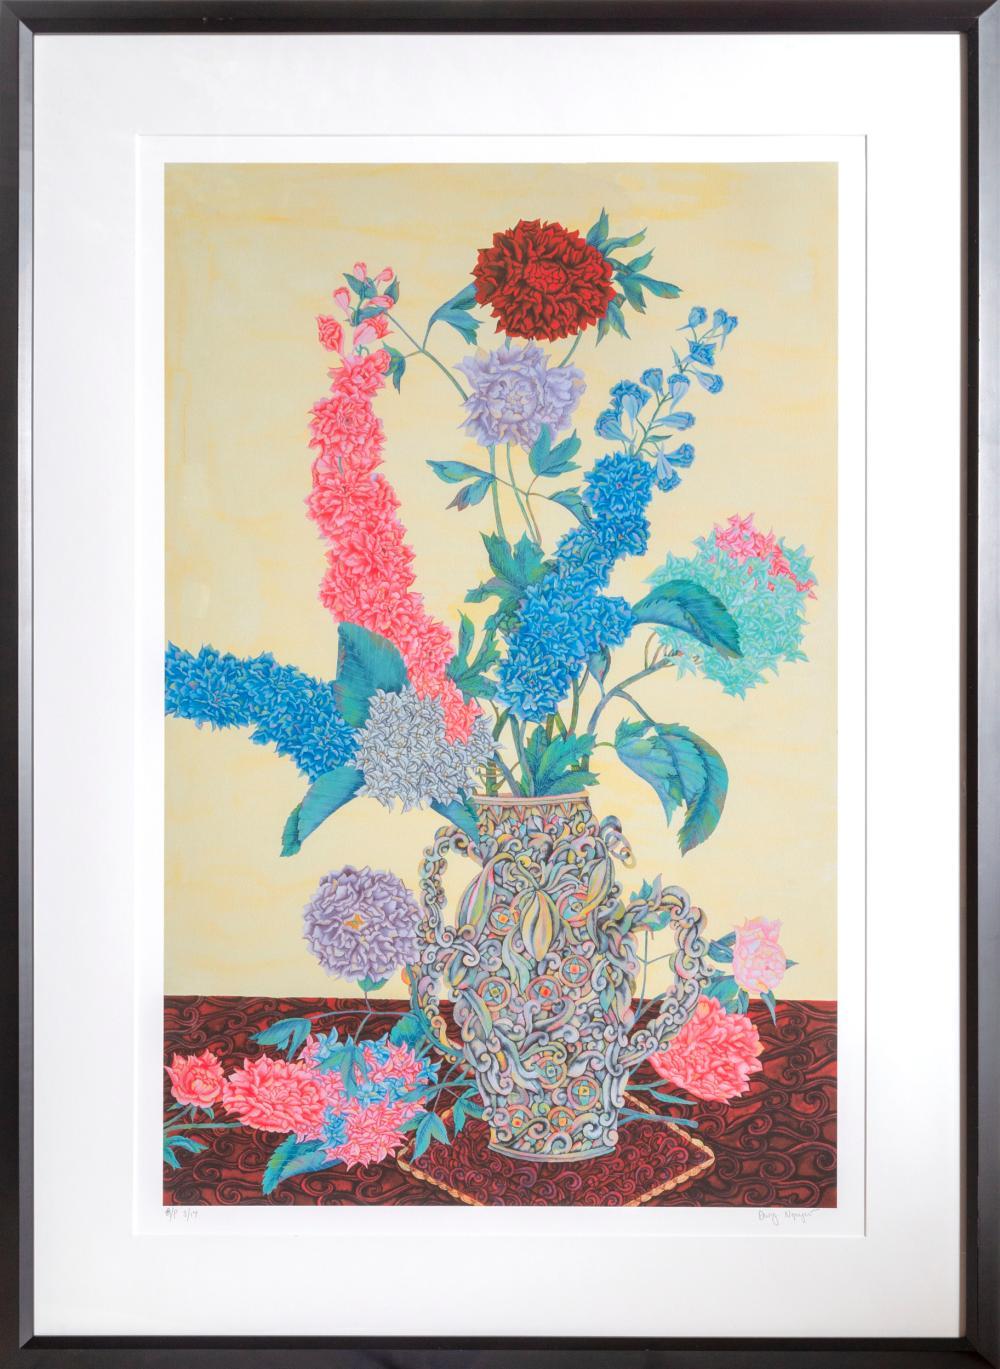 David Nguyen, Flowers 15, Lithograph